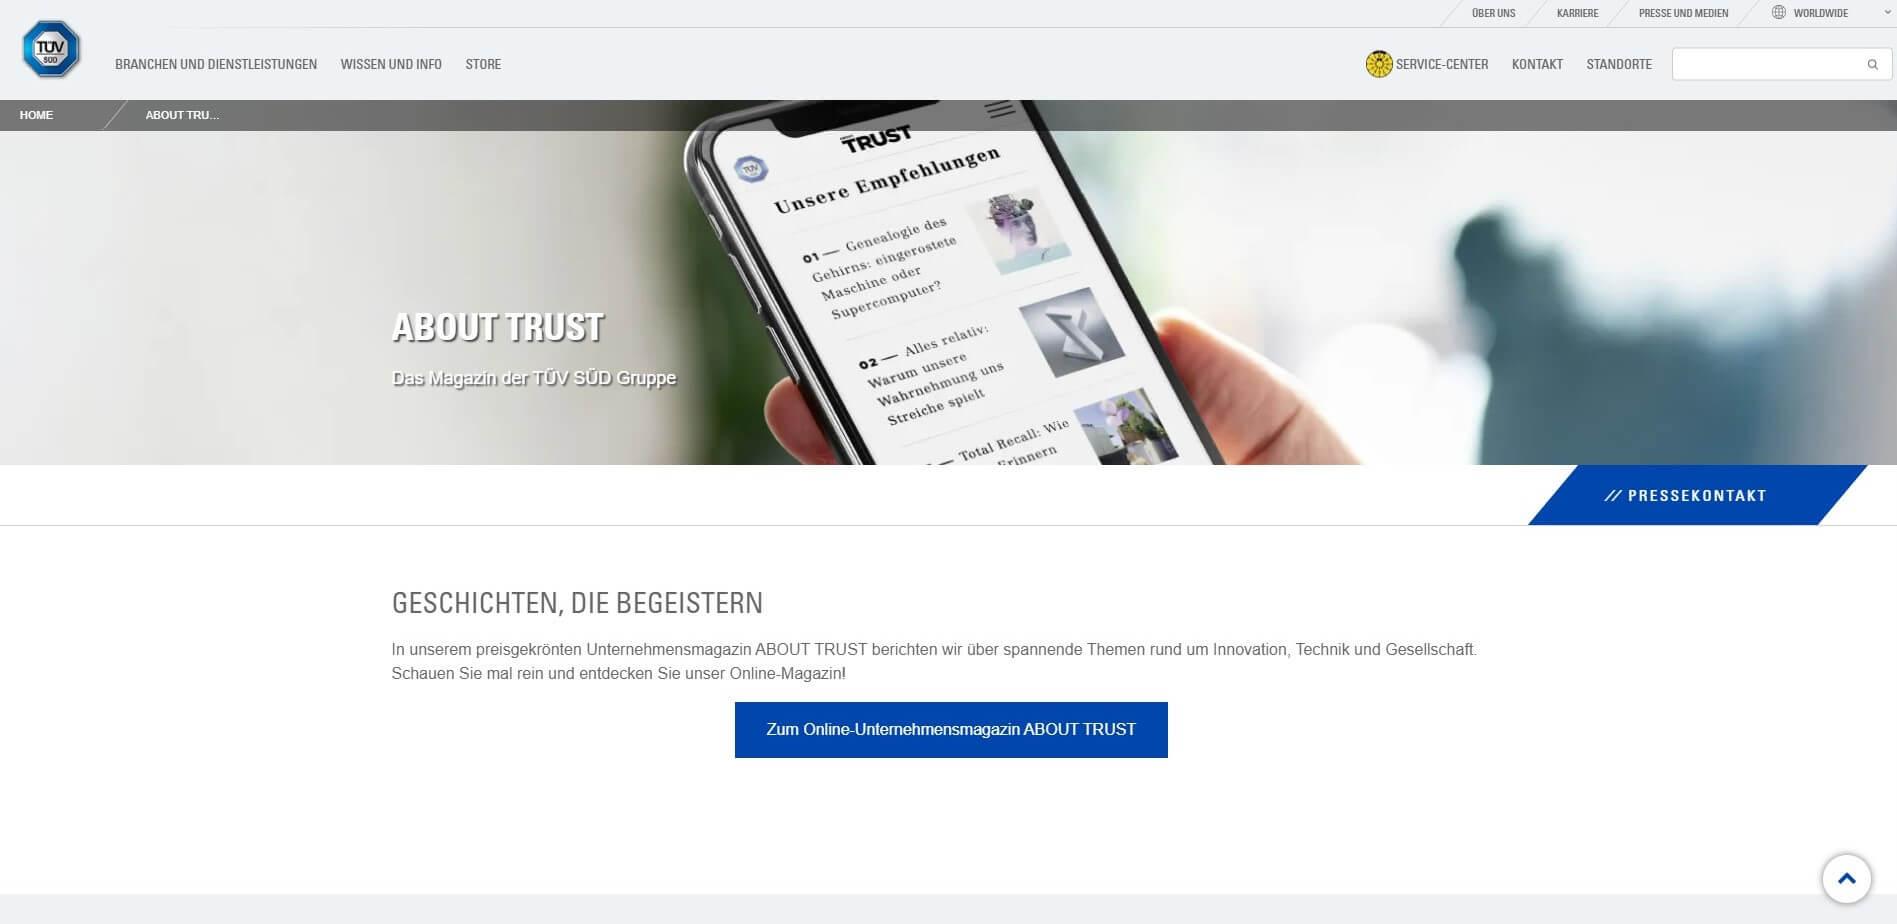 B2B-Content-Marketing-TUEV